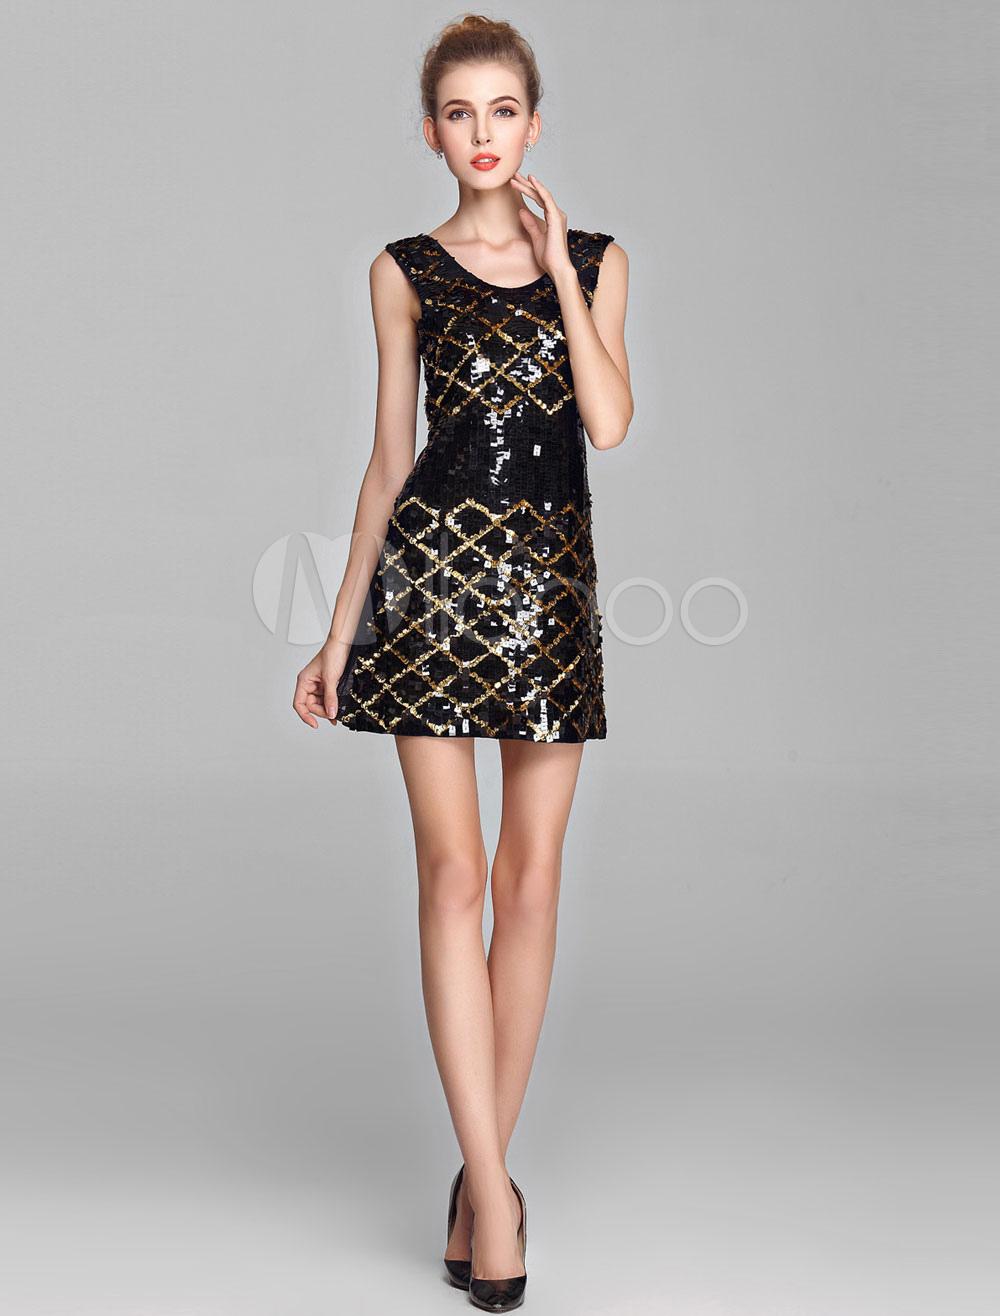 Golden and Black Plaid Sequin Cocktail Dress (Wedding Cheap Party Dress) photo